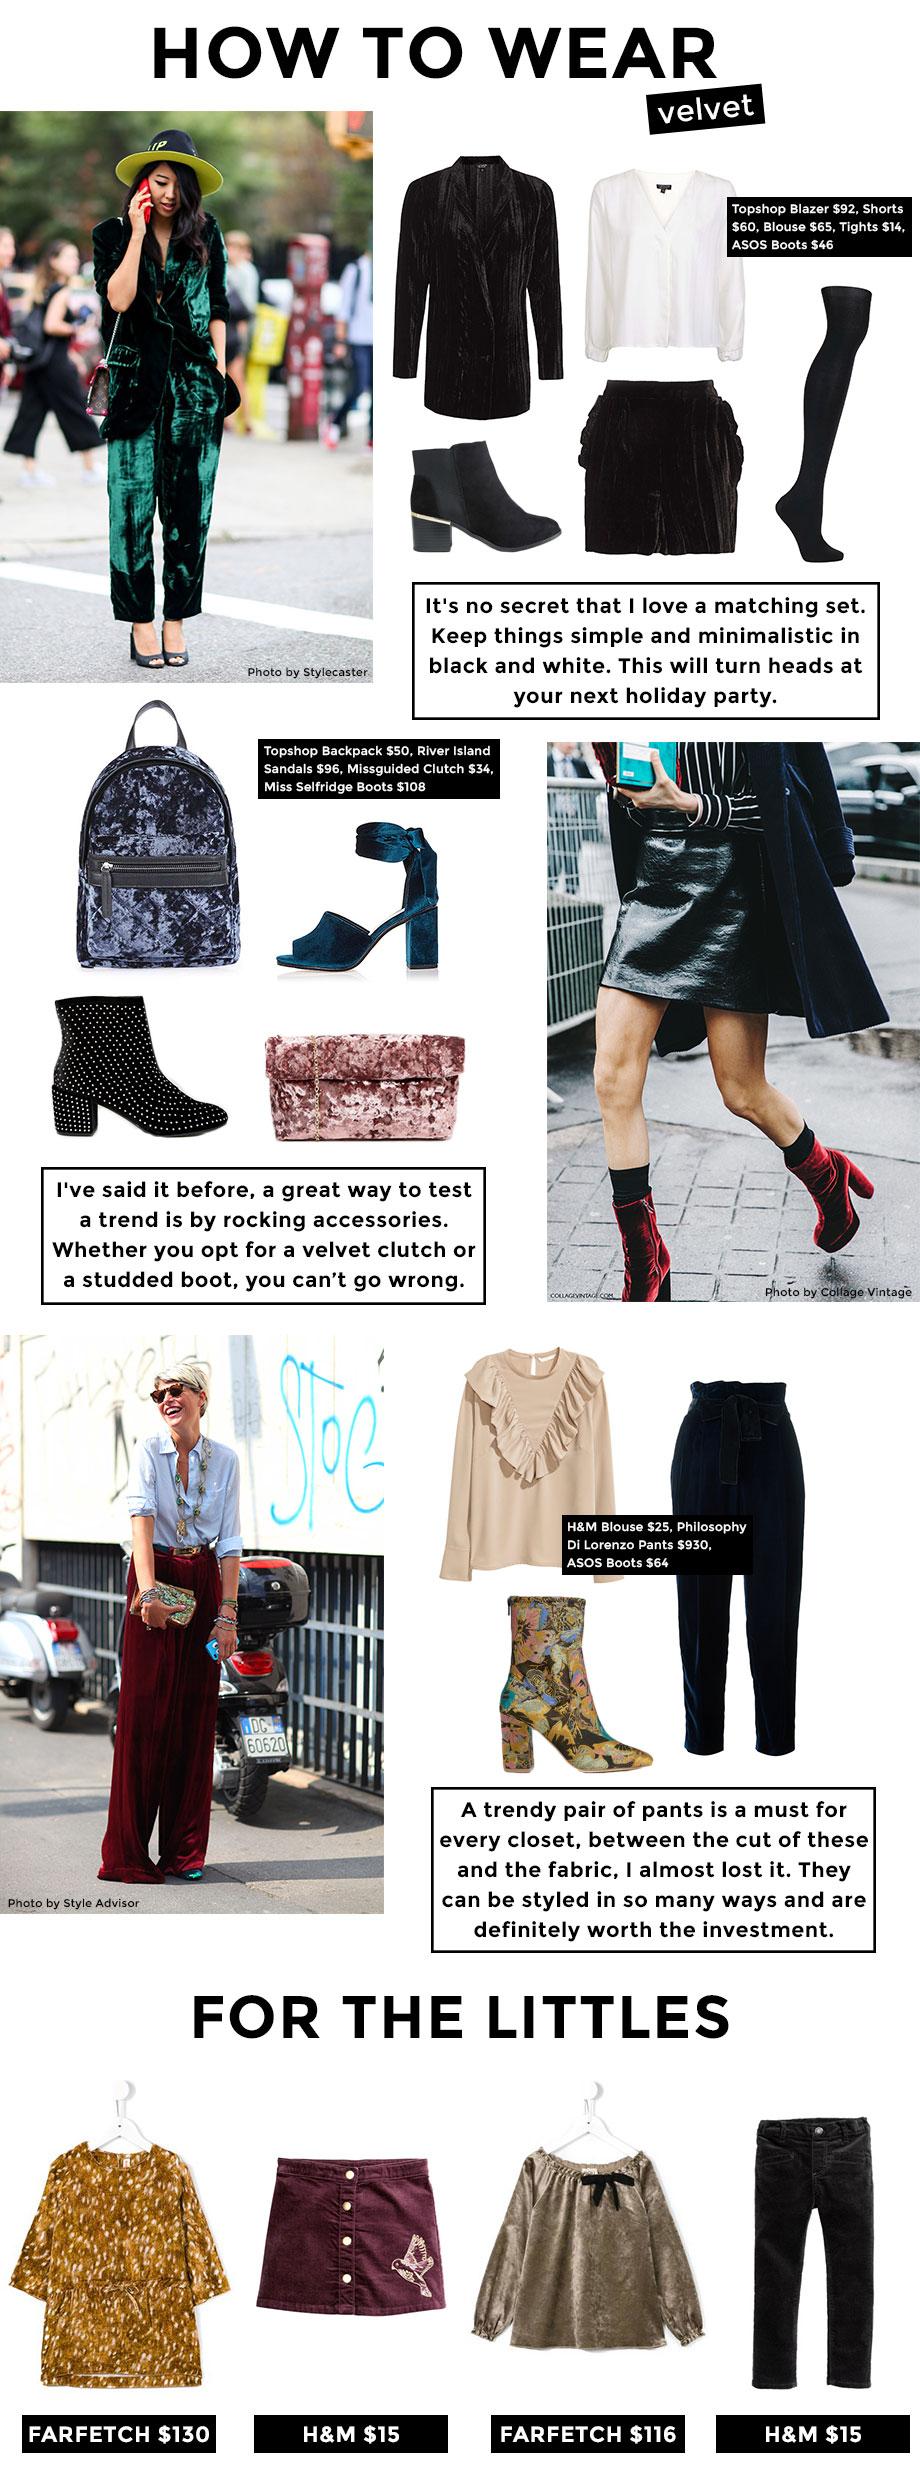 How to wear velvet like a fashion pro.